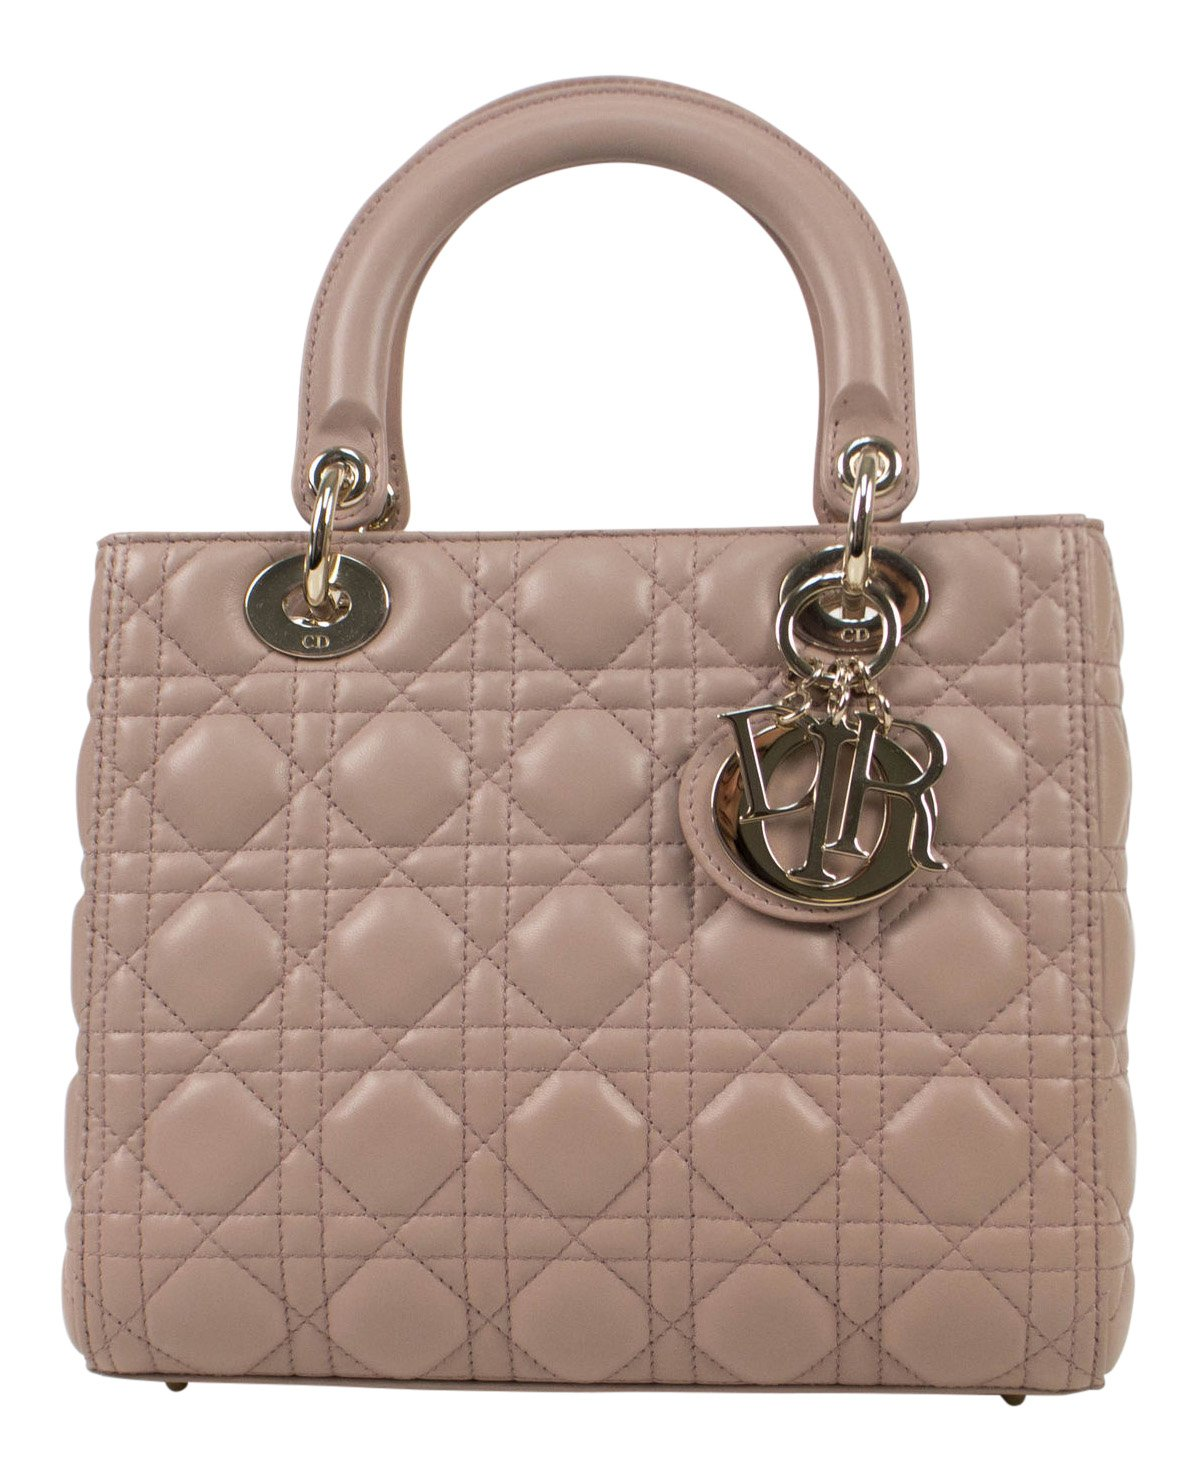 Amazon.com  Christian Dior  Lady Dior  Pink Cannage Leather Handbag  Baby 636d40645f7bb